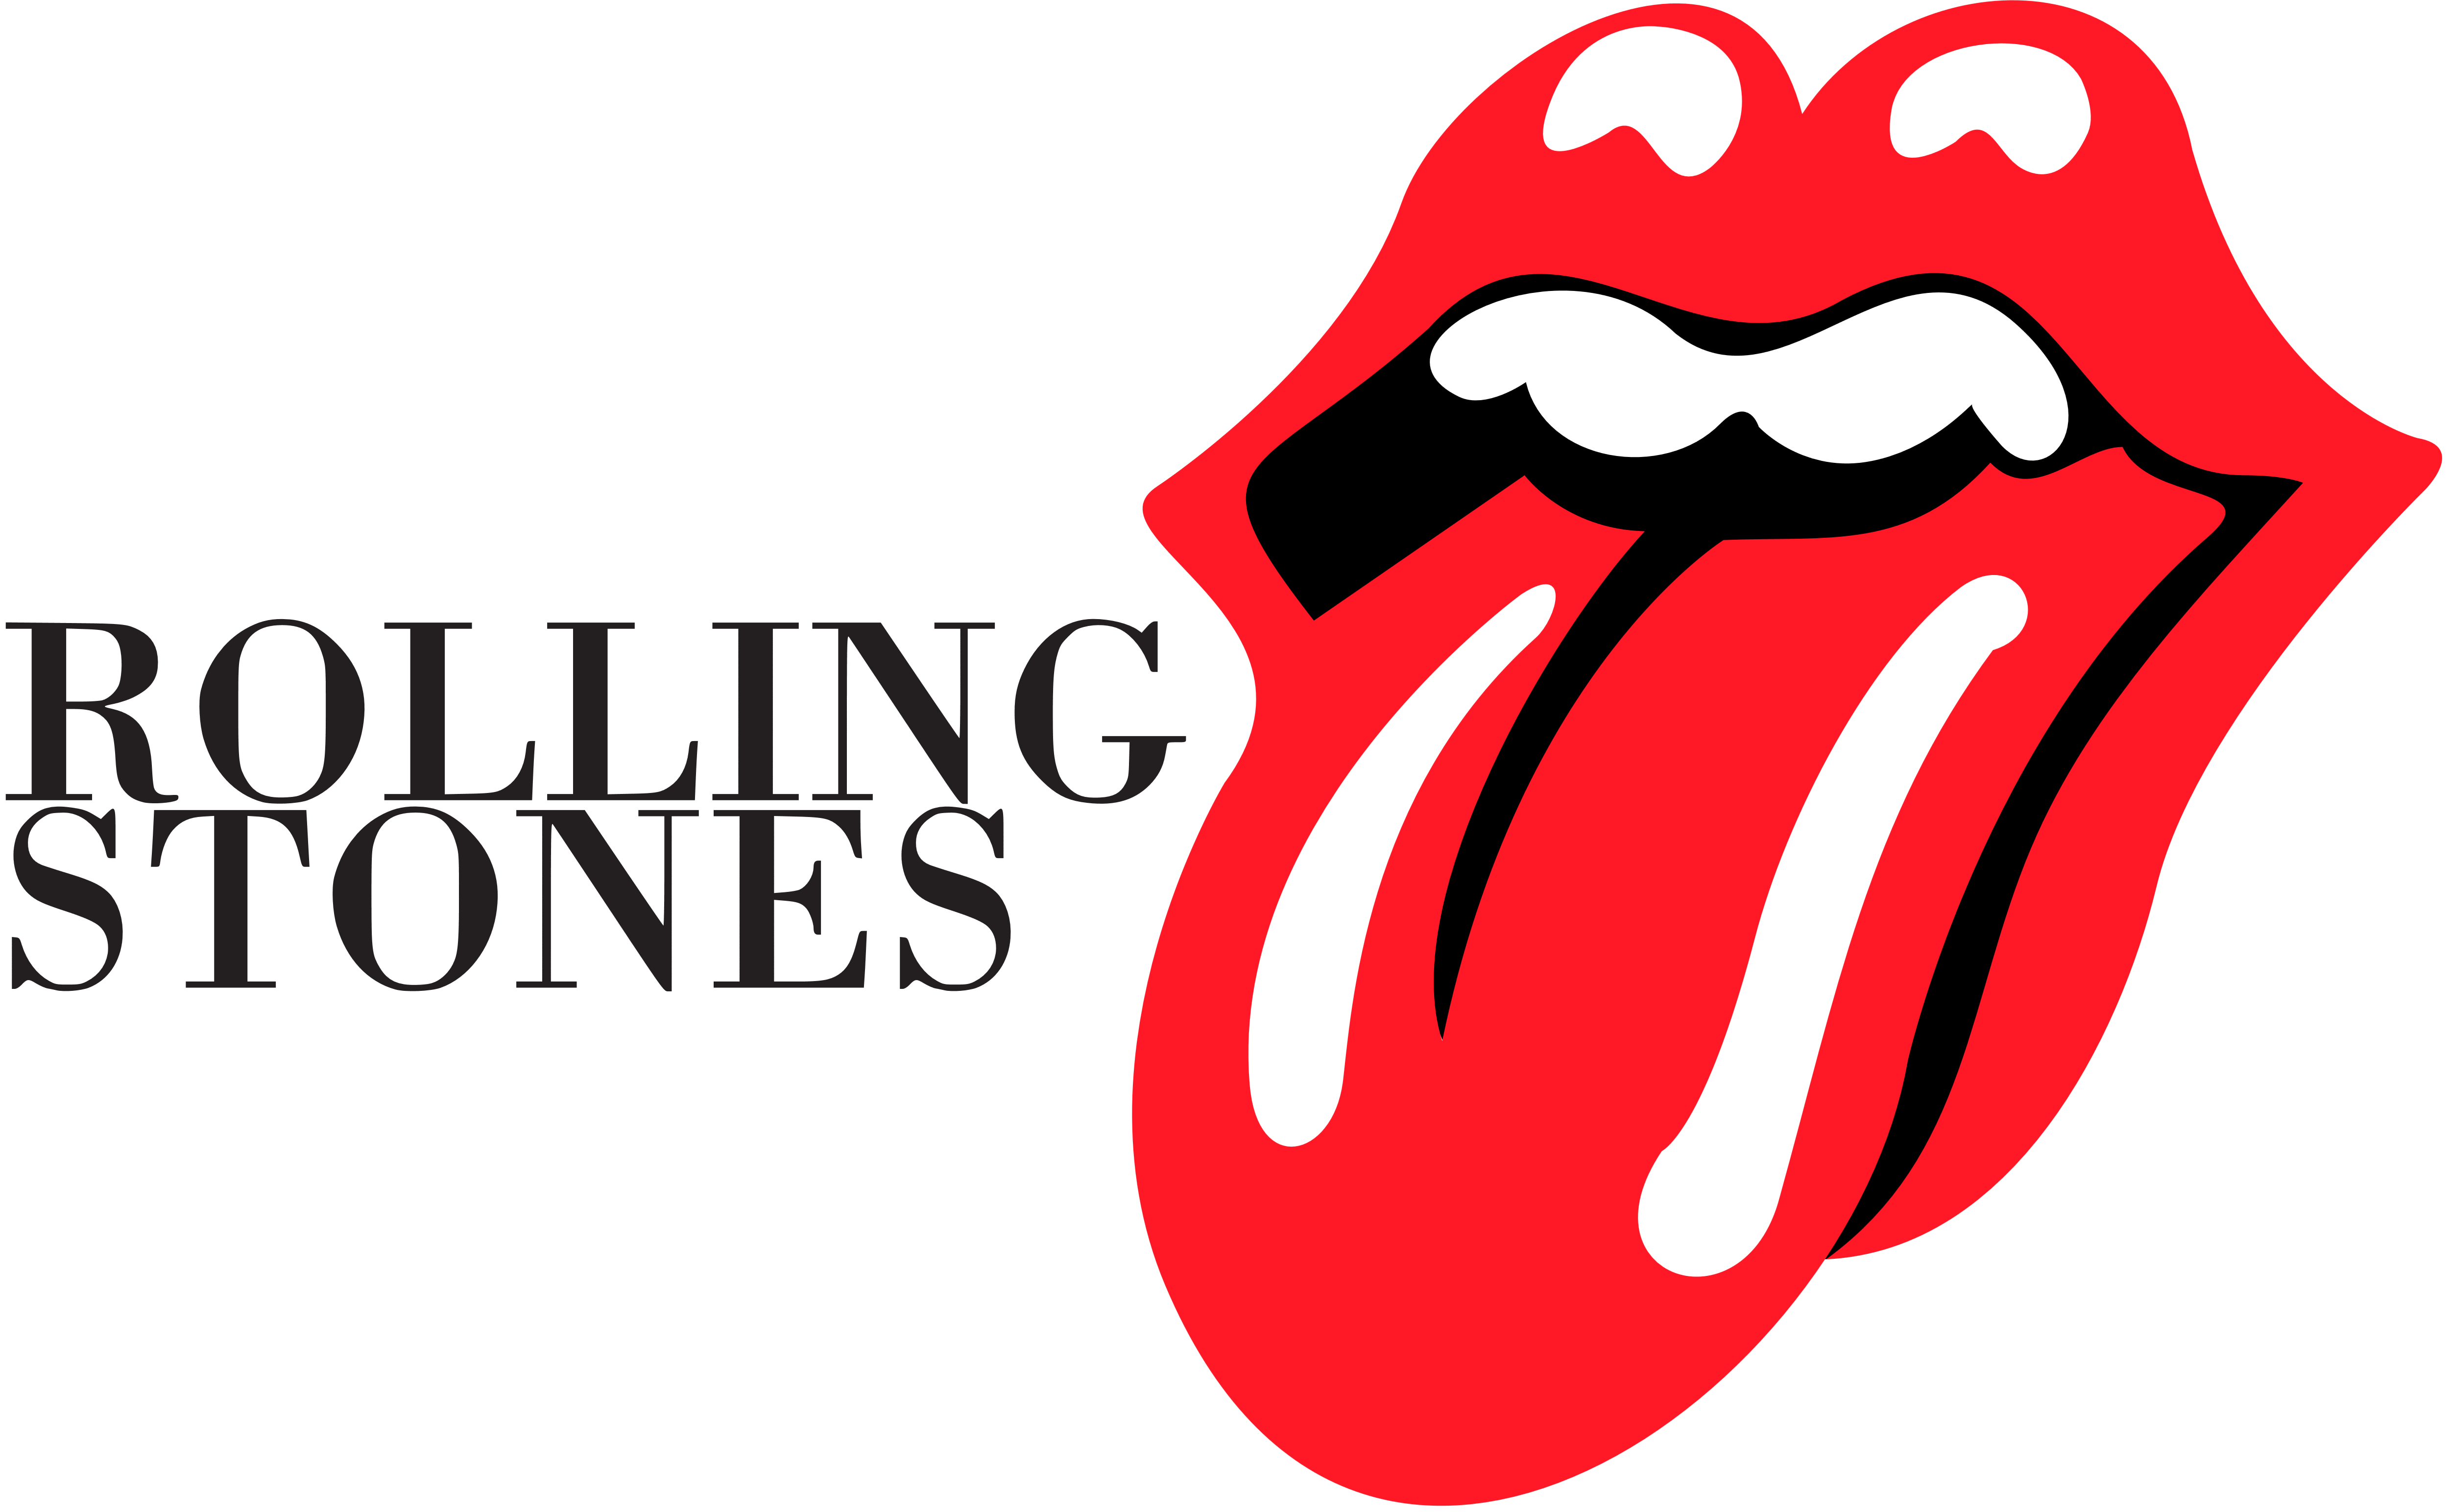 the_rolling_stones_logo